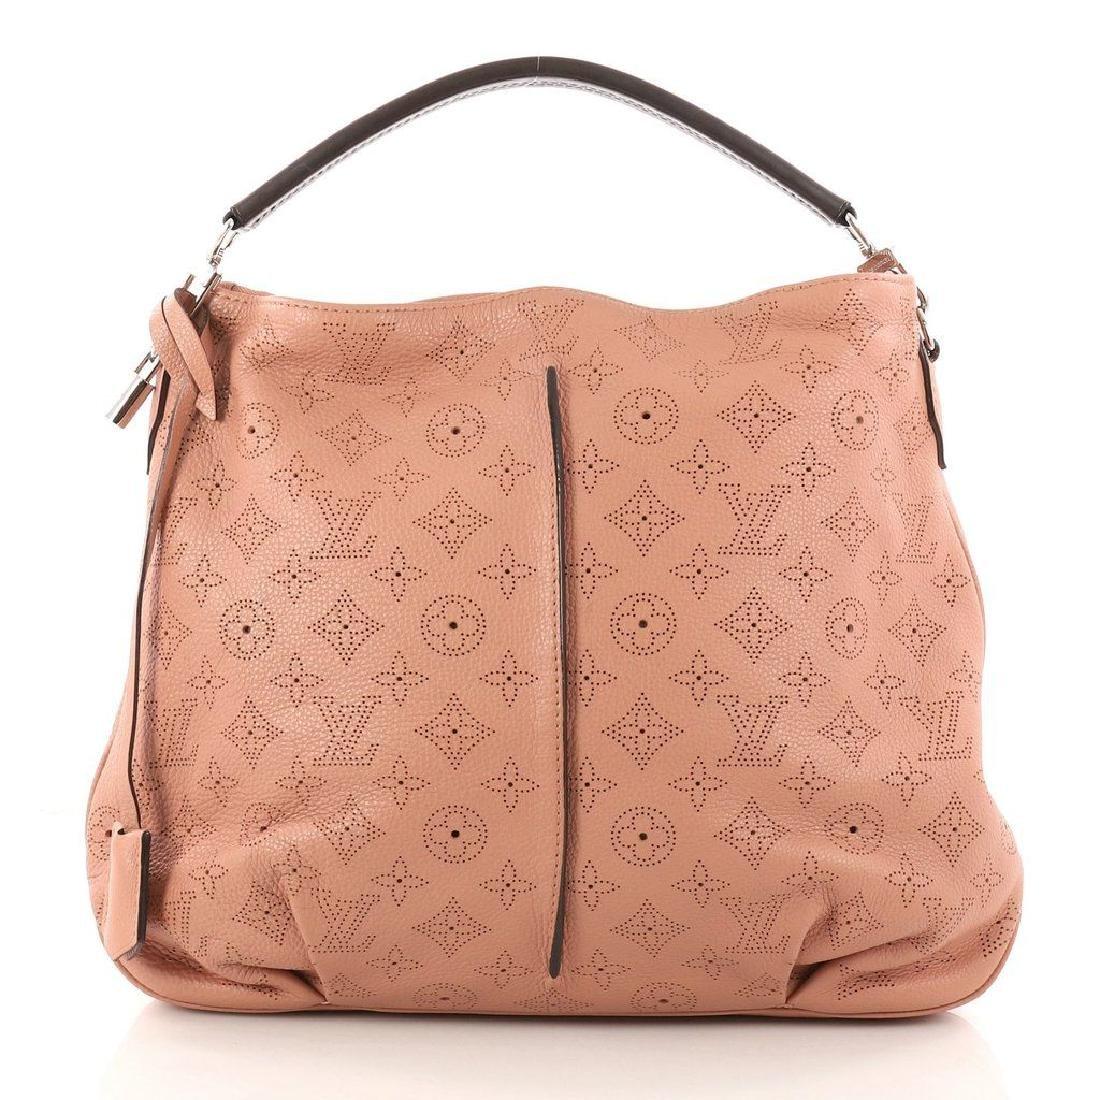 Louis Vuitton Selene Mahina Handbag Pm Pink Salmon - 3